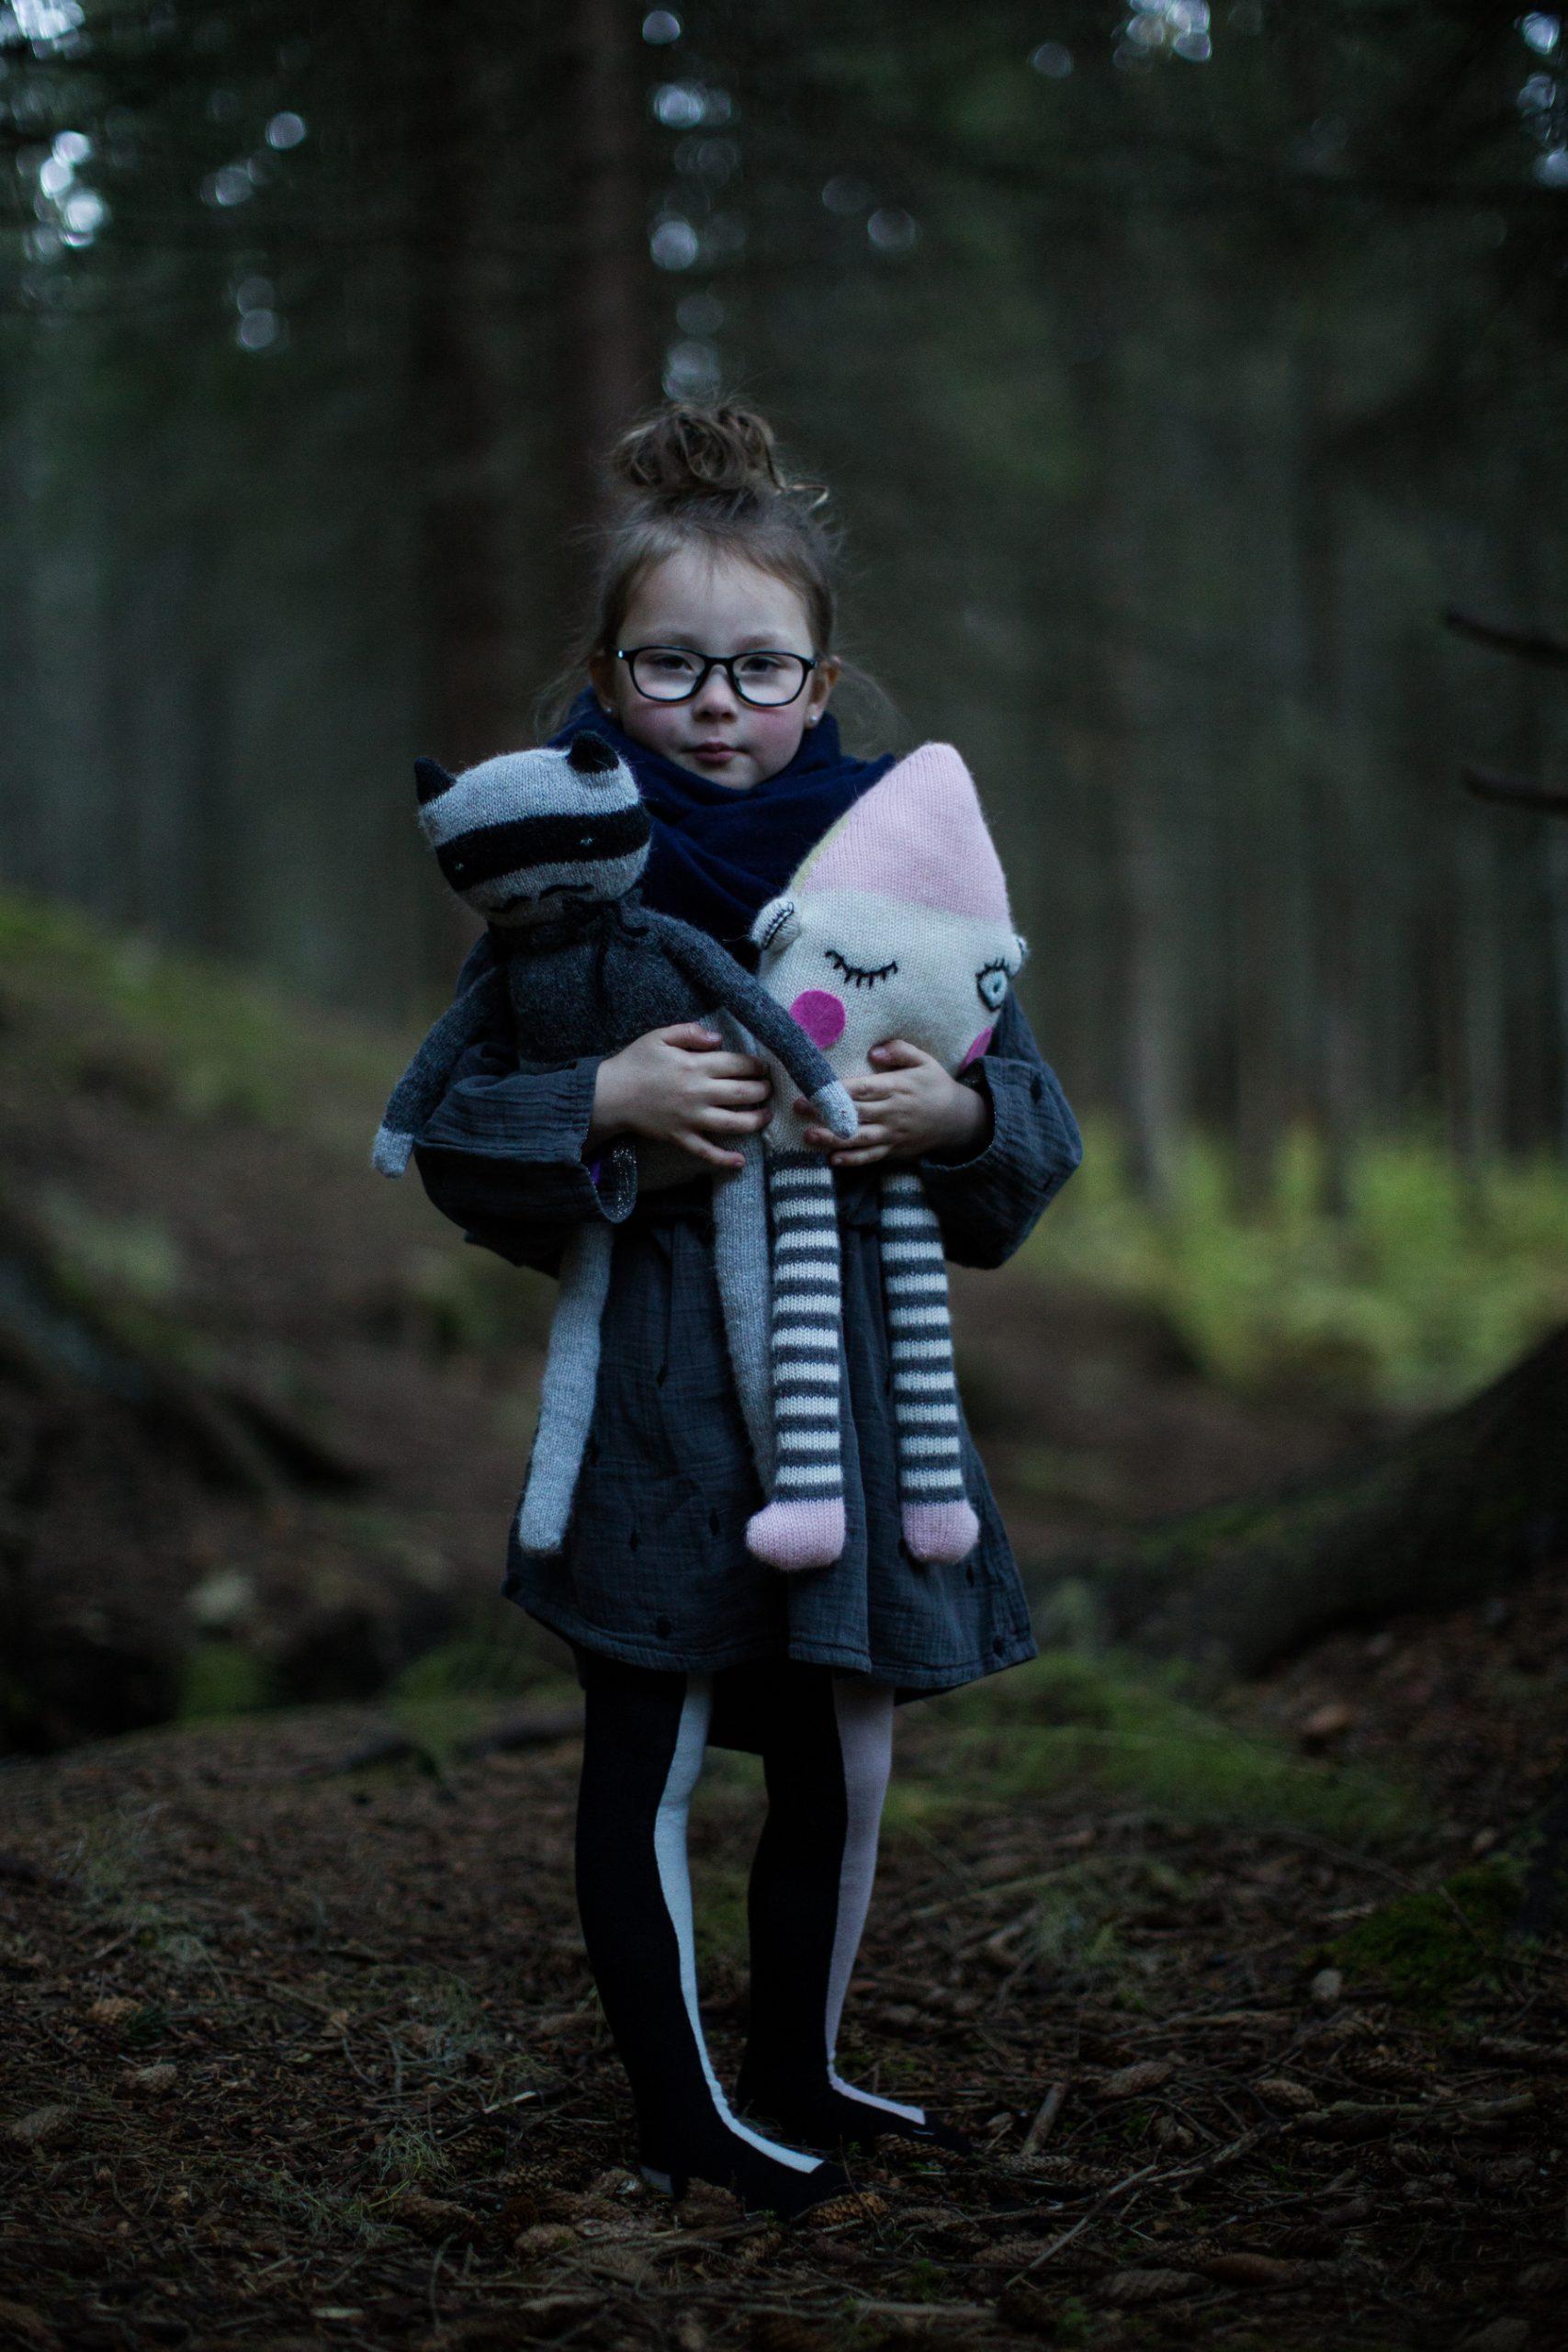 superhero, kidstoy, stuffed animal, gdåpsgave gutt, babyshower gift boy, handmade doll